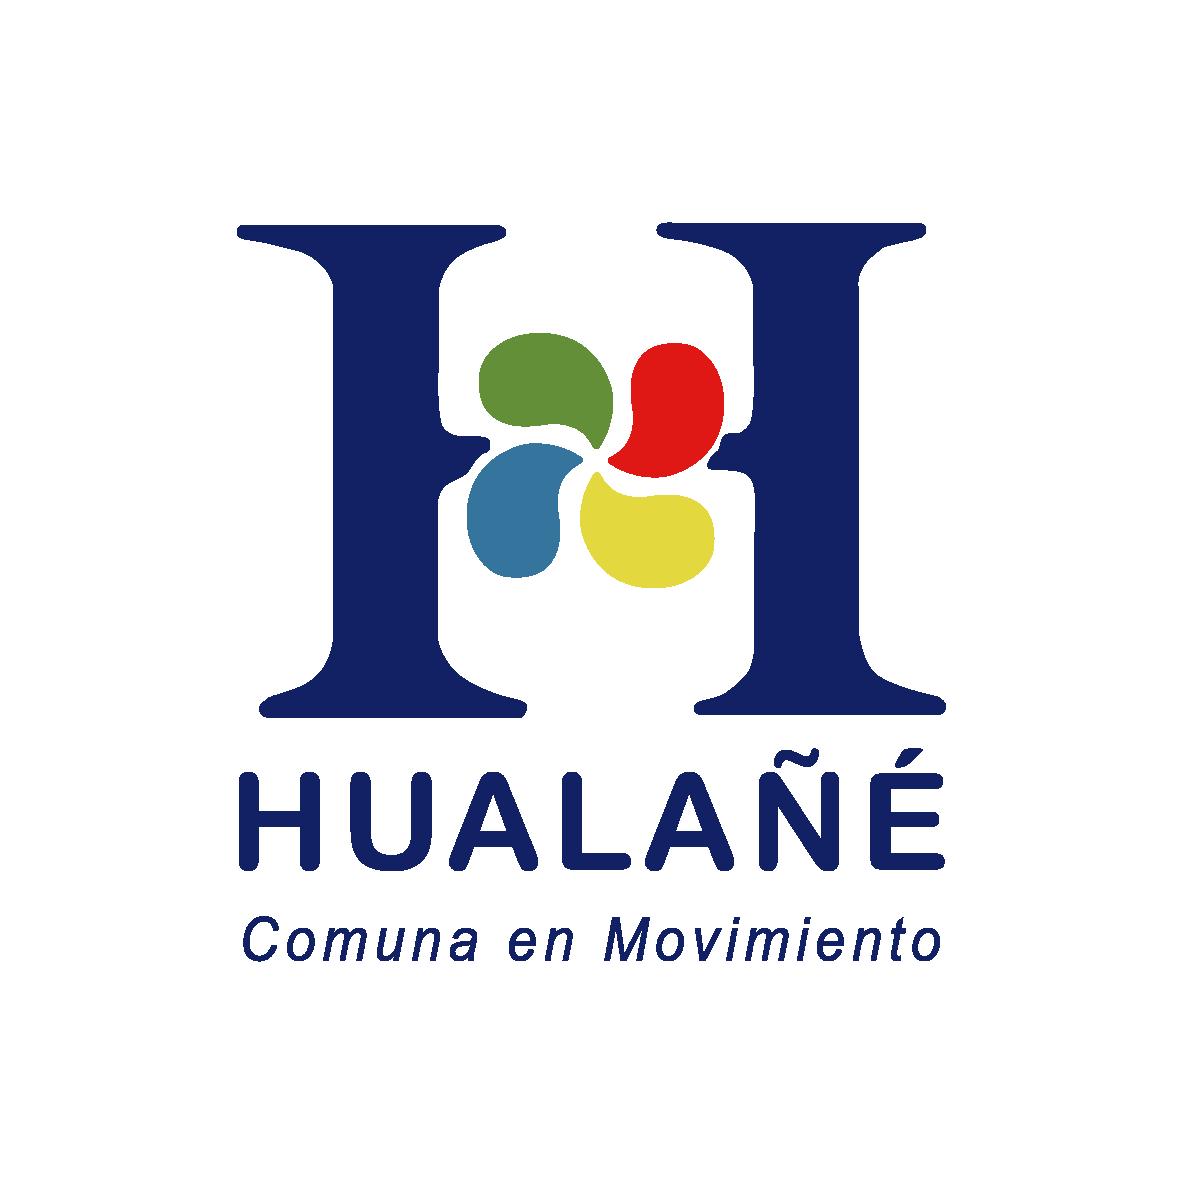 HUALAÑE.png